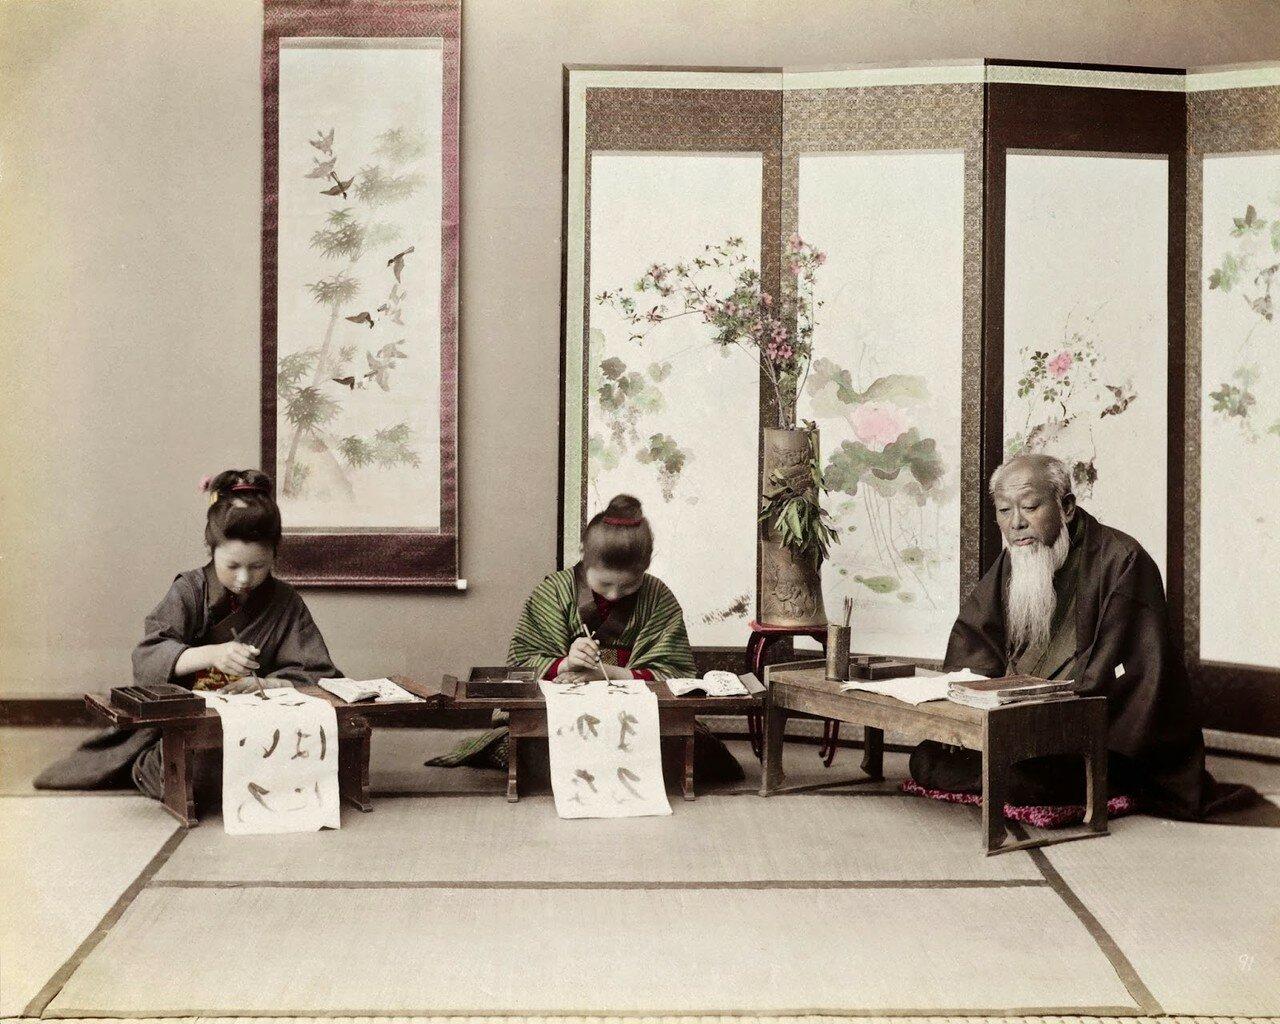 Девушки учатся каллиграфии у мастера-каллиграфа. 1890